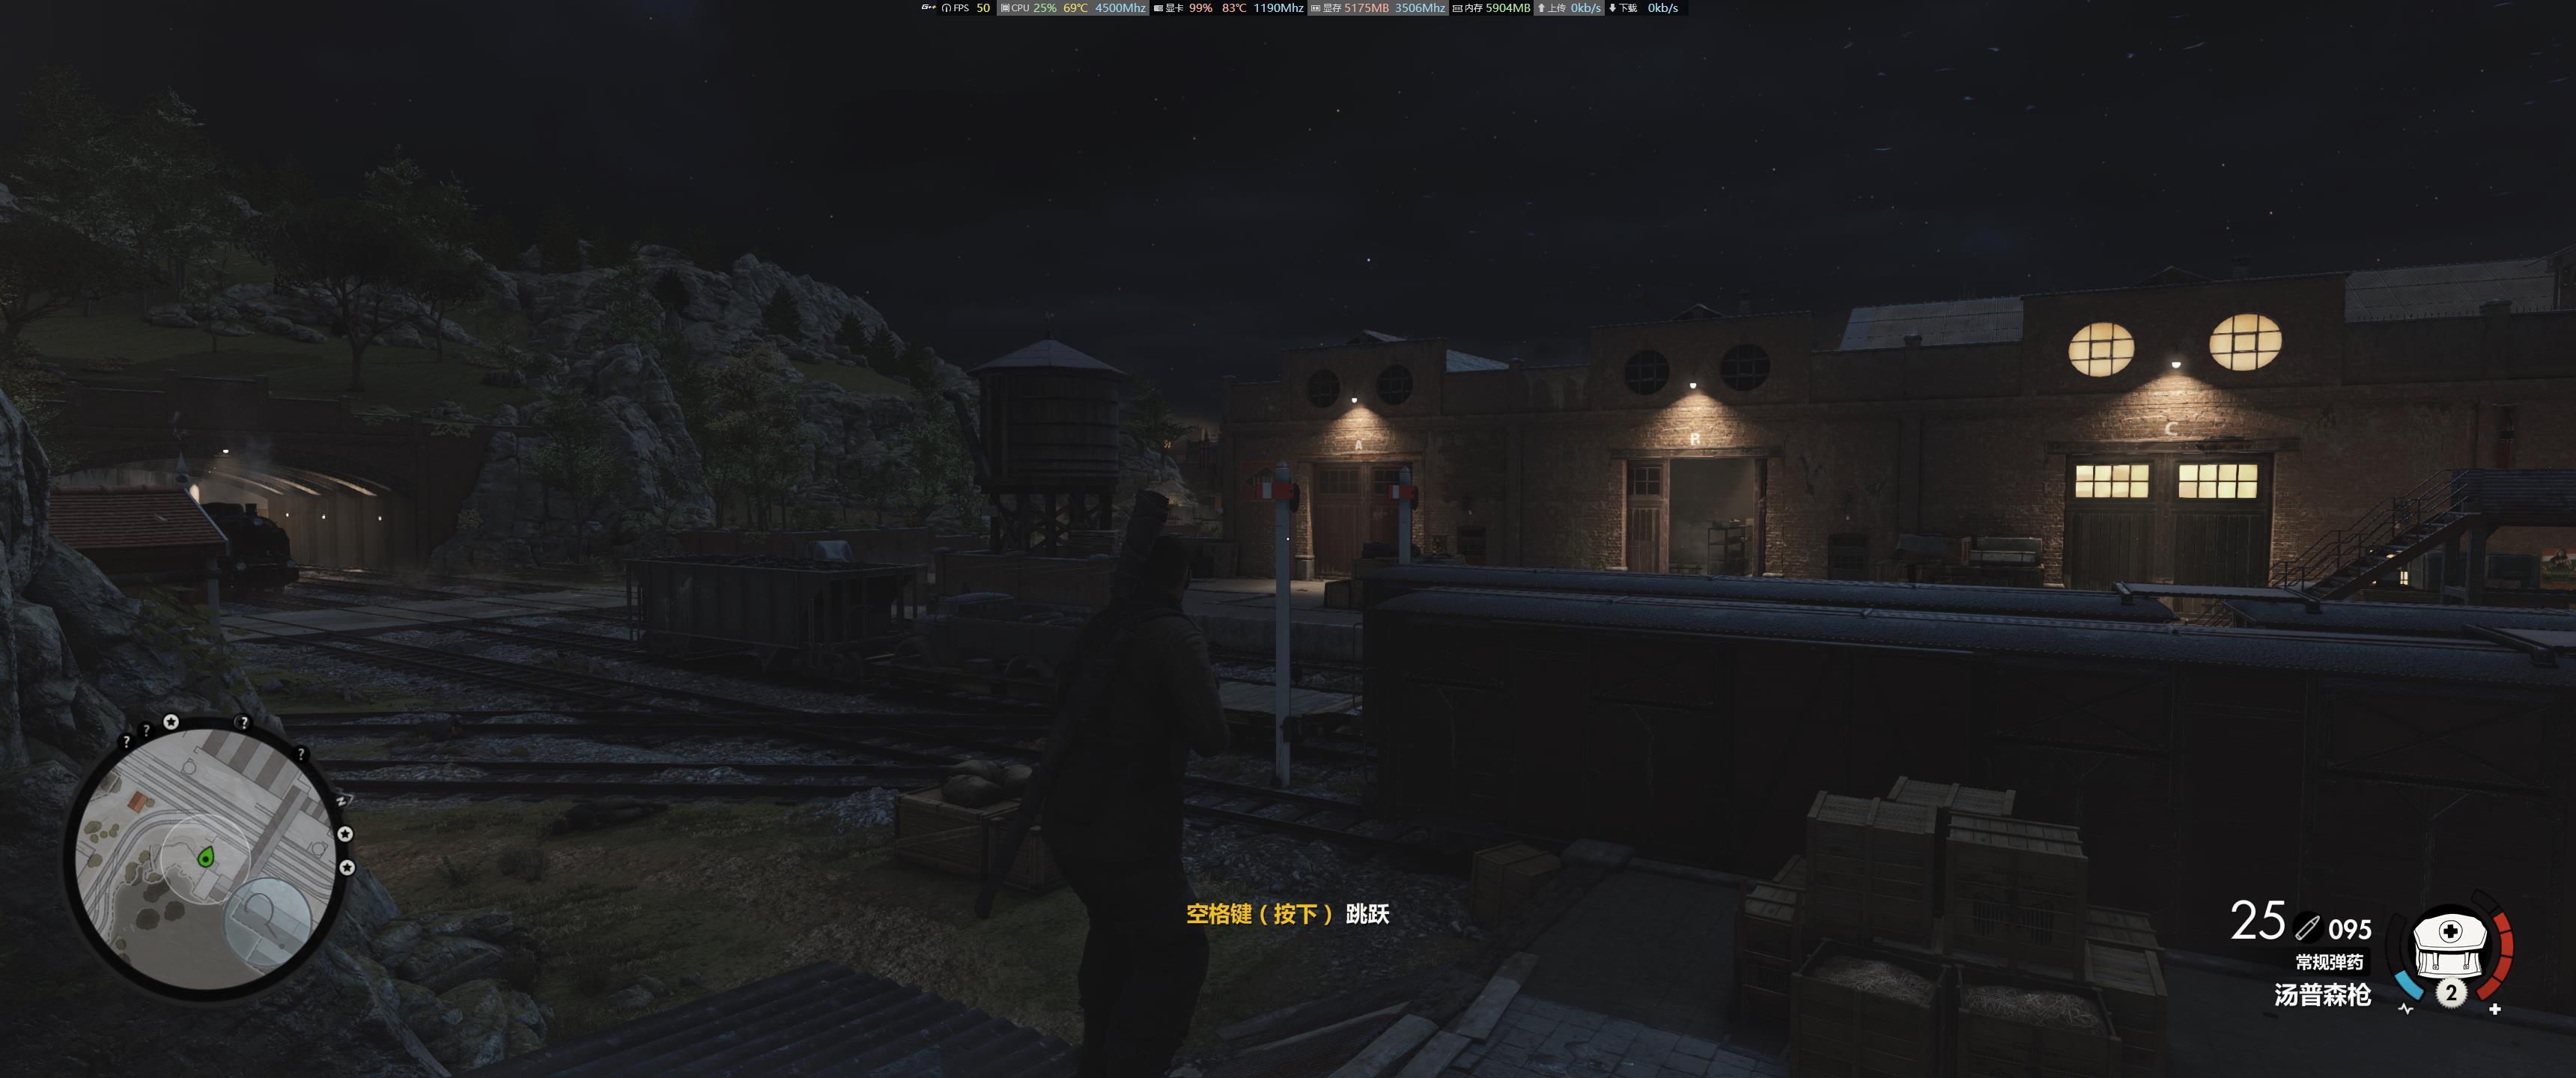 SniperElite4_DX11-01-21-00-22.jpg